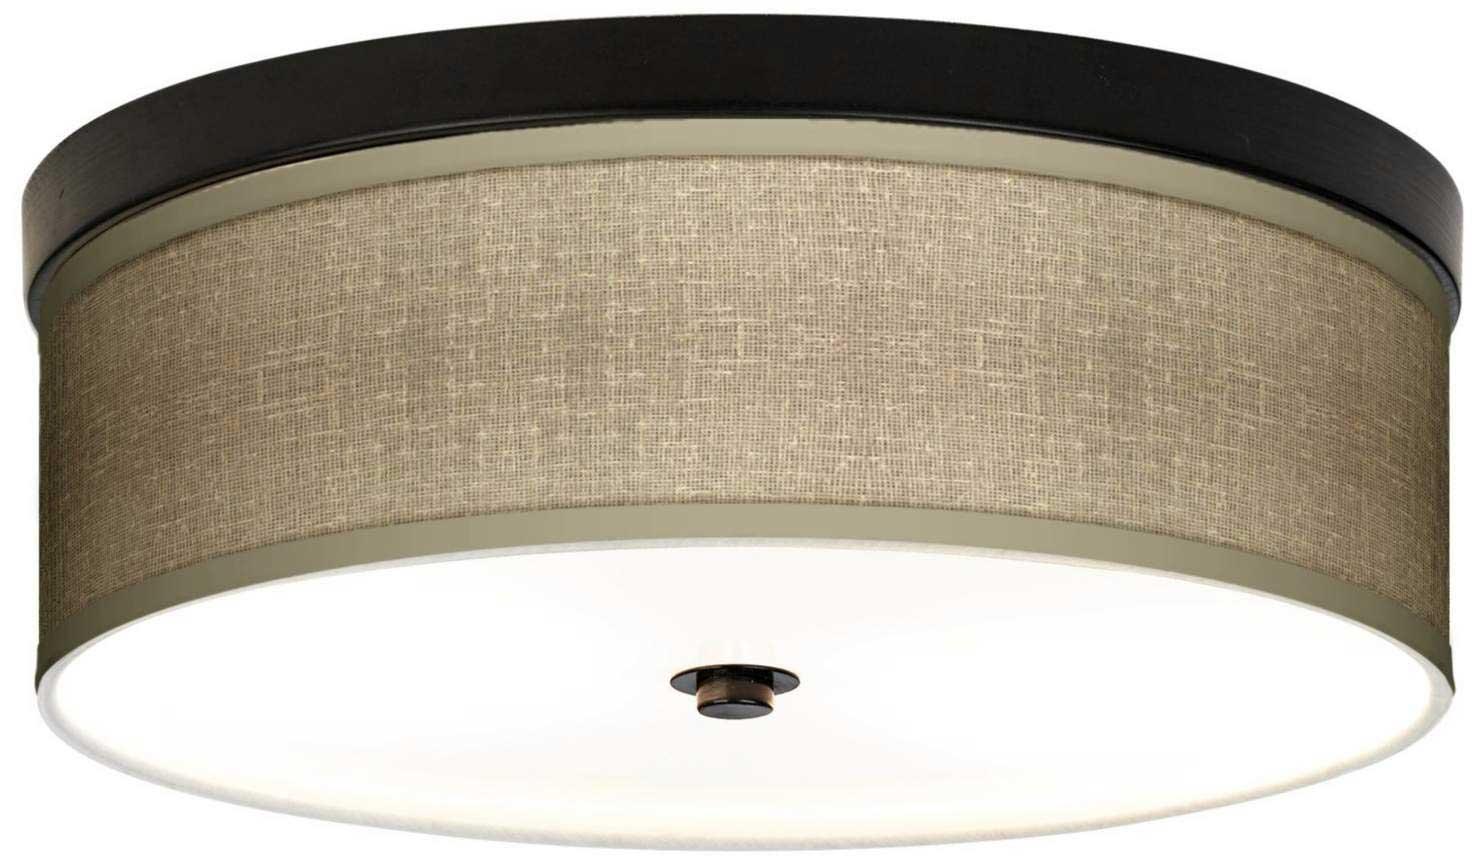 Lamps Plus Picture Lights